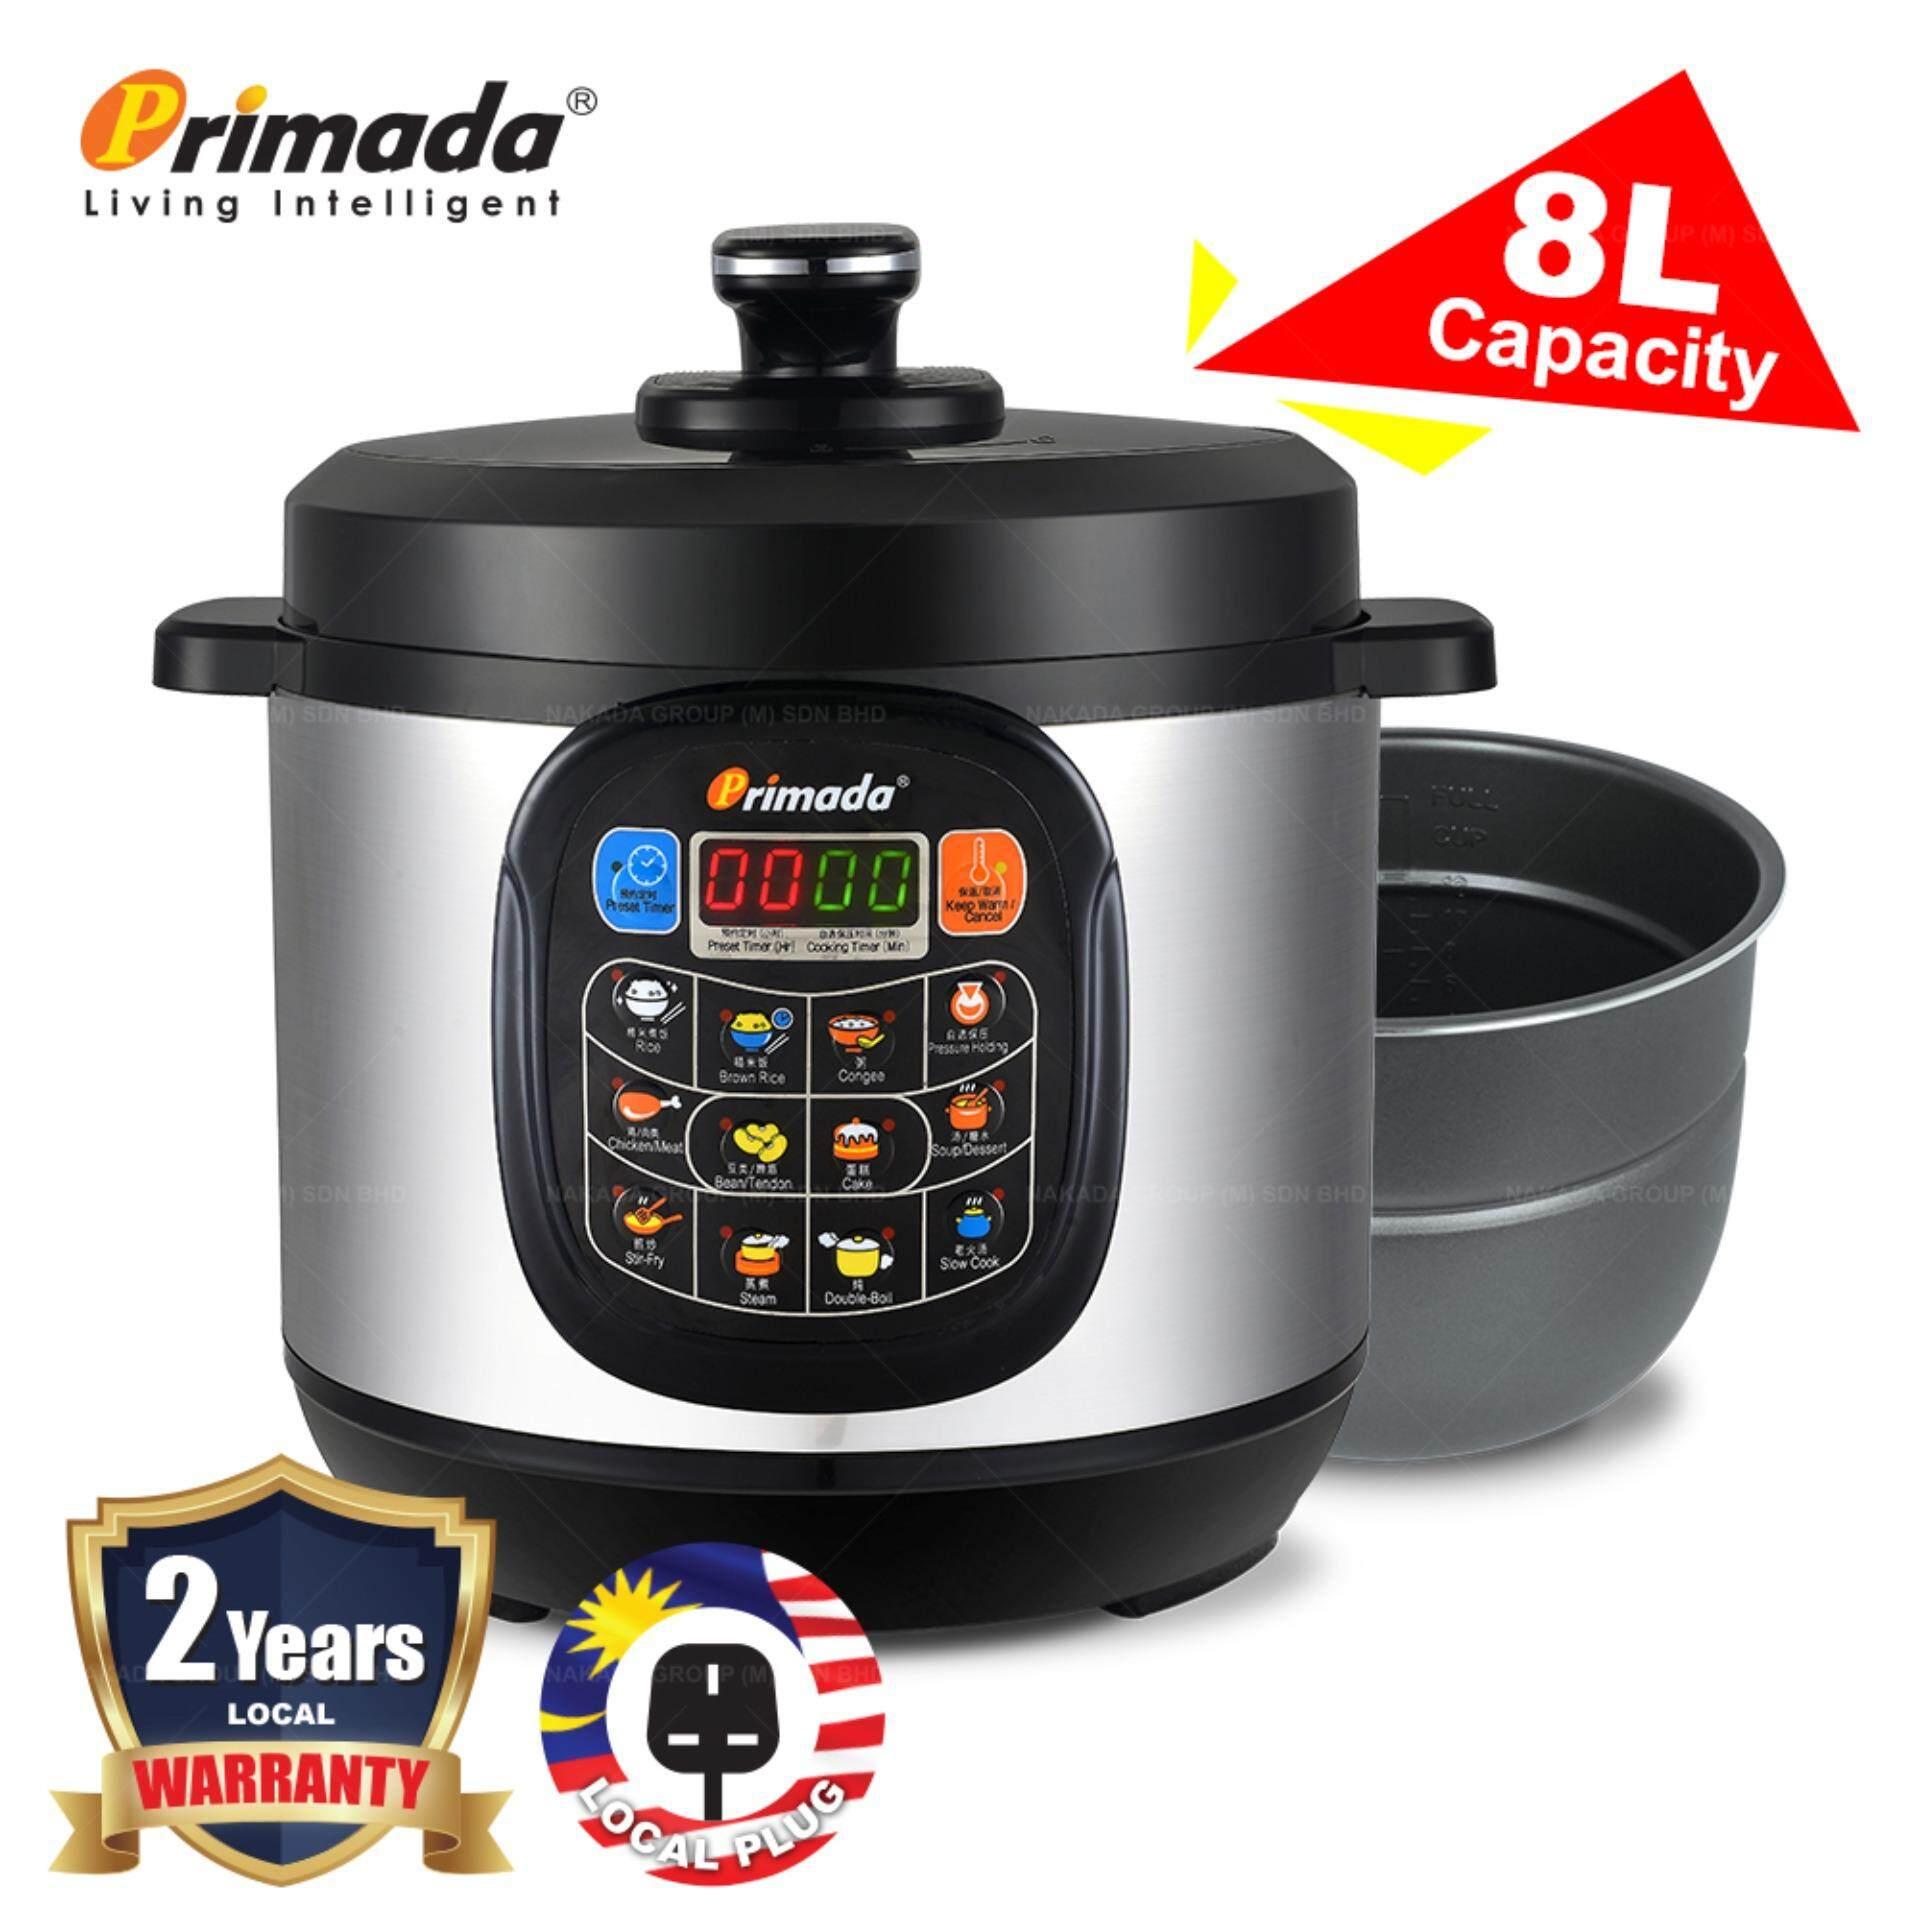 Primada 8 Liter Jumbo Pressure Cooker PC8030 Basic PC8030 Basic